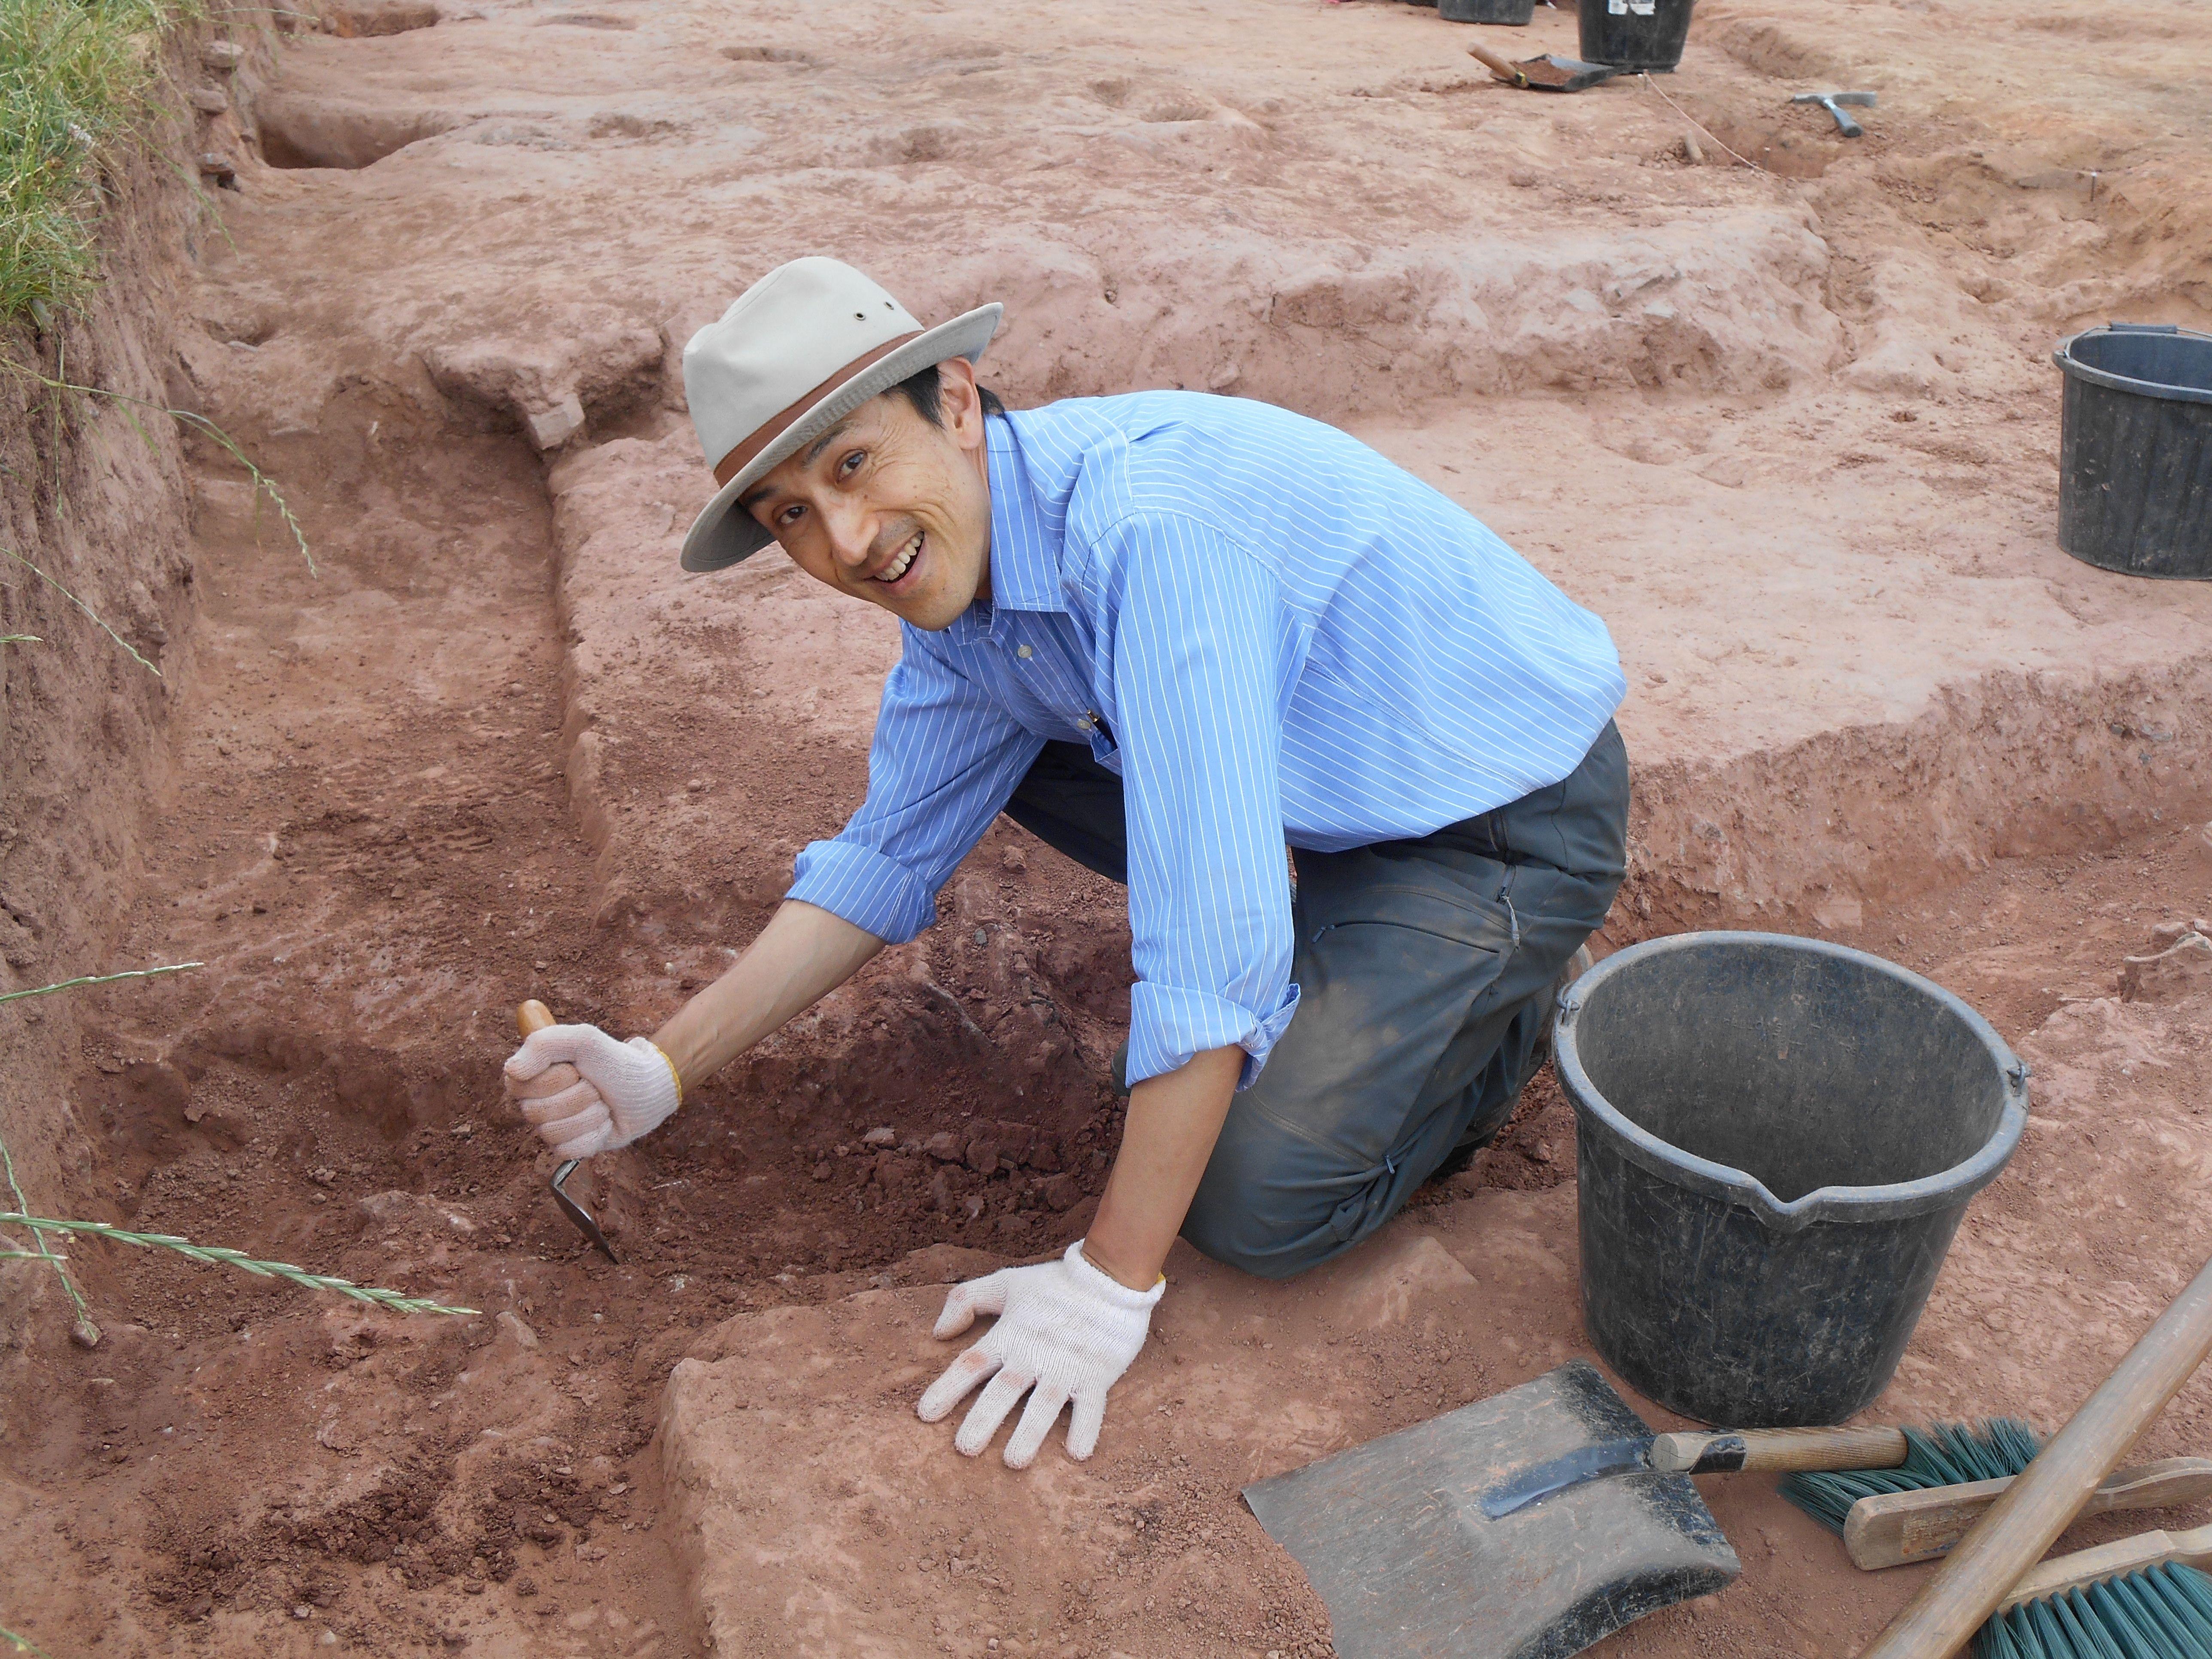 Koji Mizoguchi, Professor of Archaeology at Kyushu University